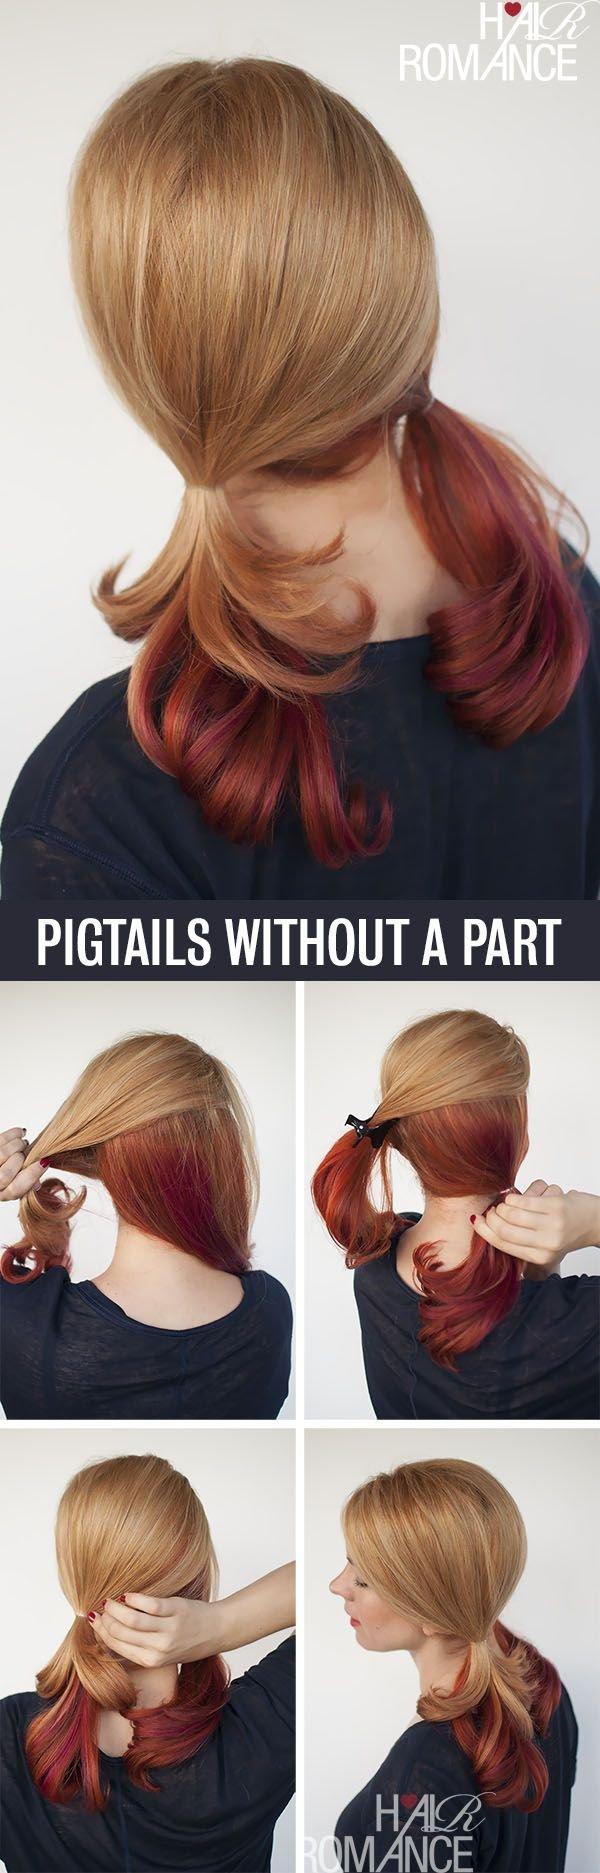 Regency Pacific,hair,clothing,brown,hairstyle,